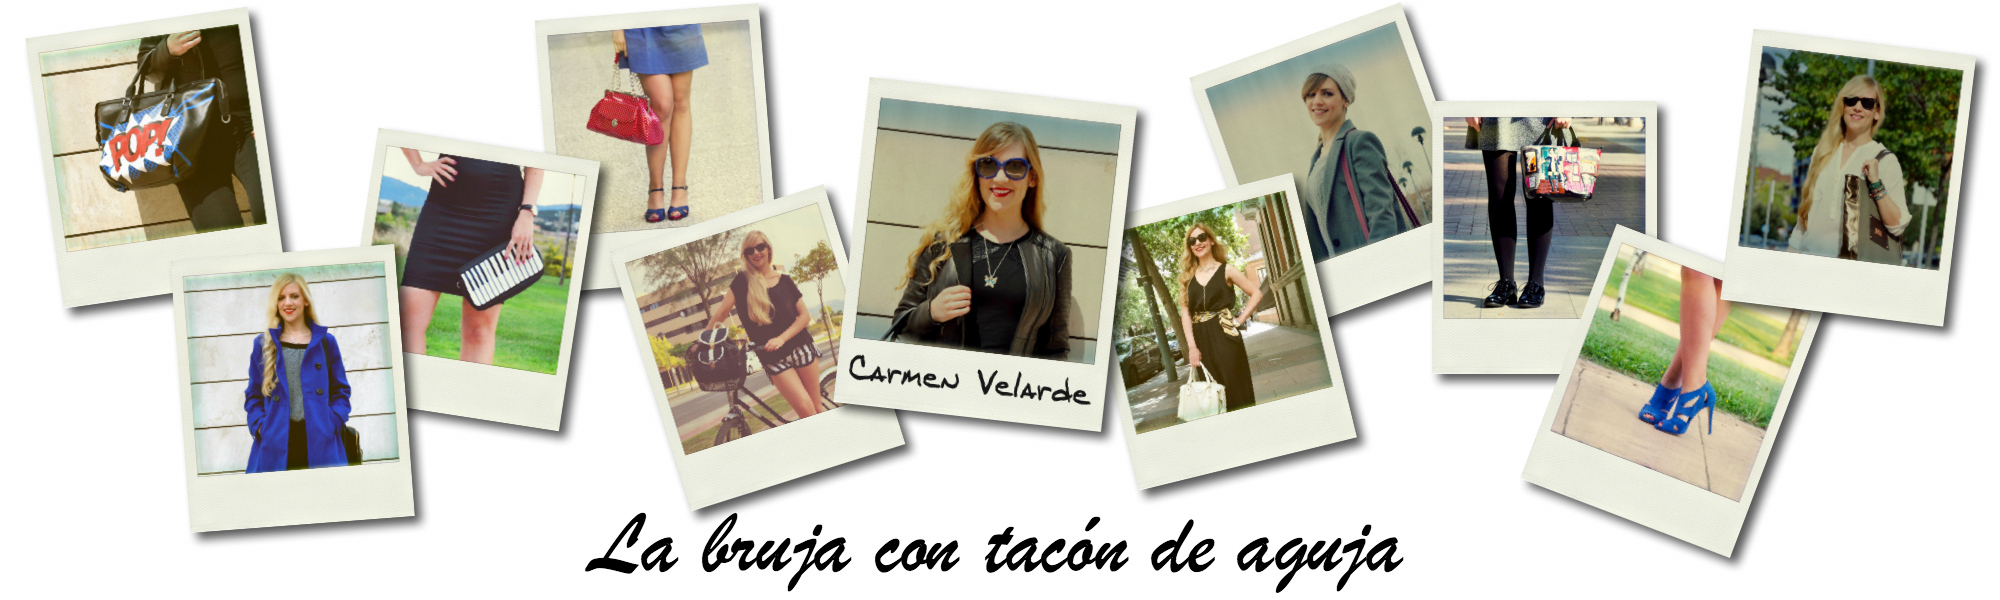 Blog de moda y videoblog de belleza de Carmen Velarde - La Bruja con tacón de aguja